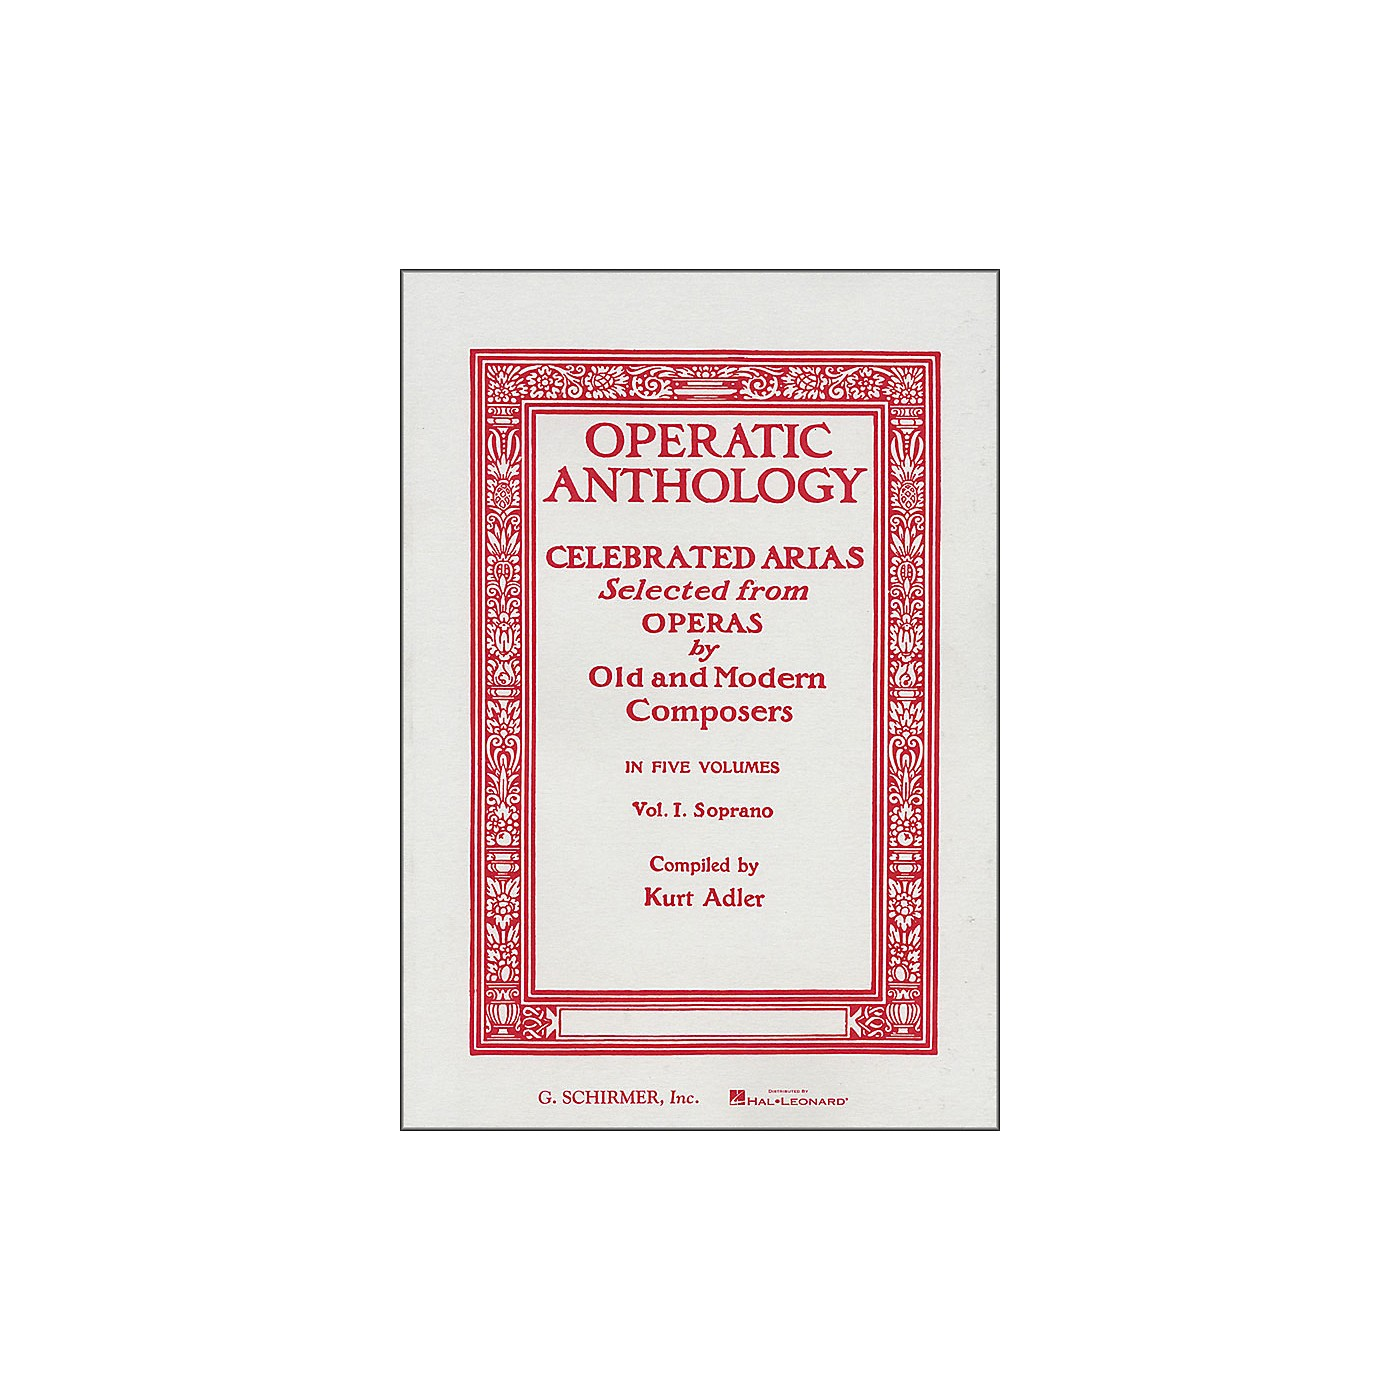 G. Schirmer Operatic Anthology Vol 1 Soprano Celebrated Arias thumbnail